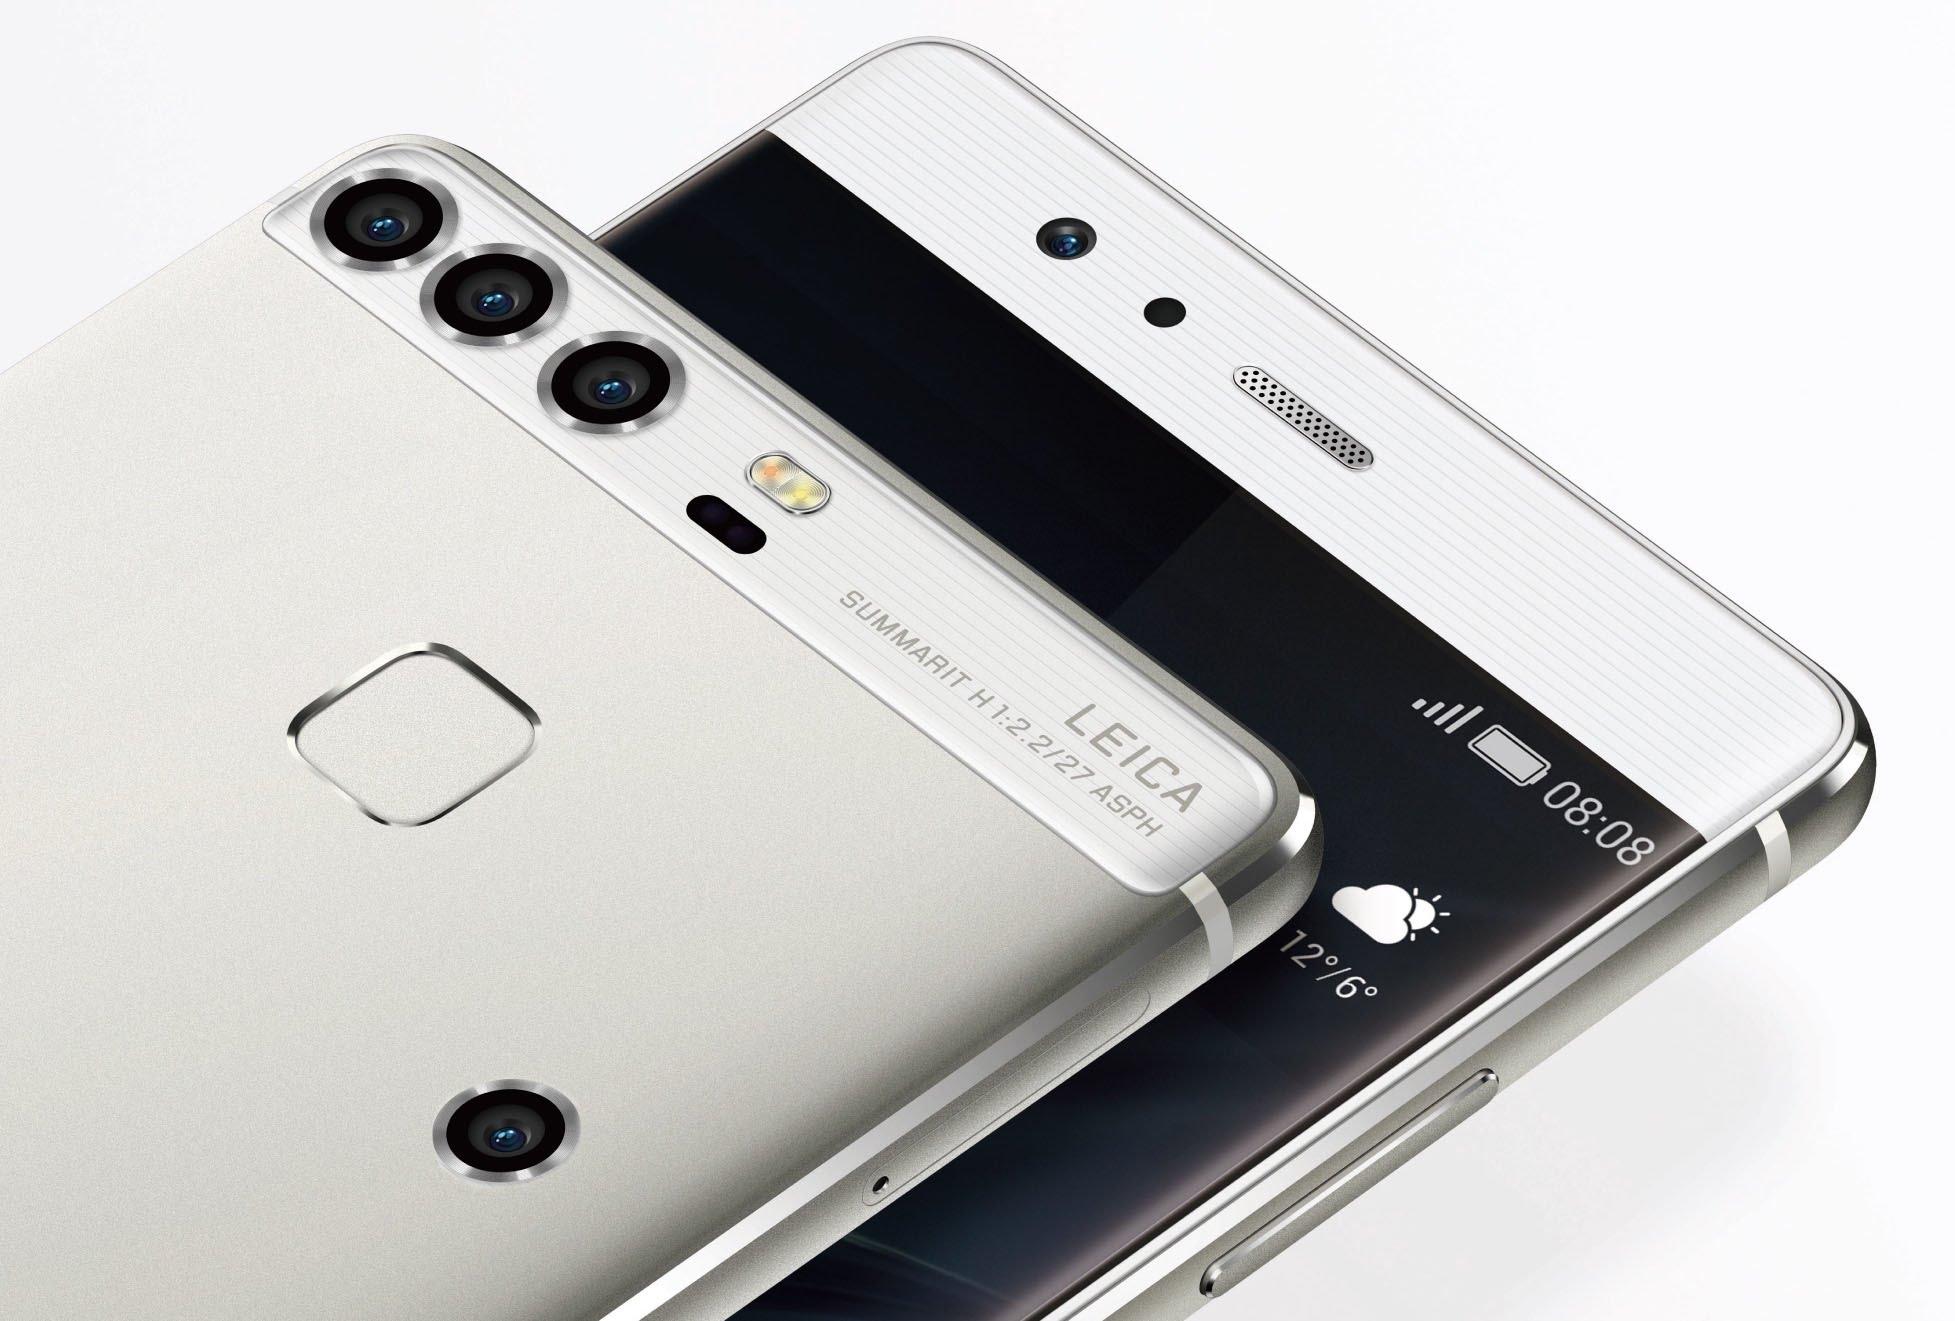 top5-smartfonov-kotorye-podesheveli-v-2017-godu-huawei-p9